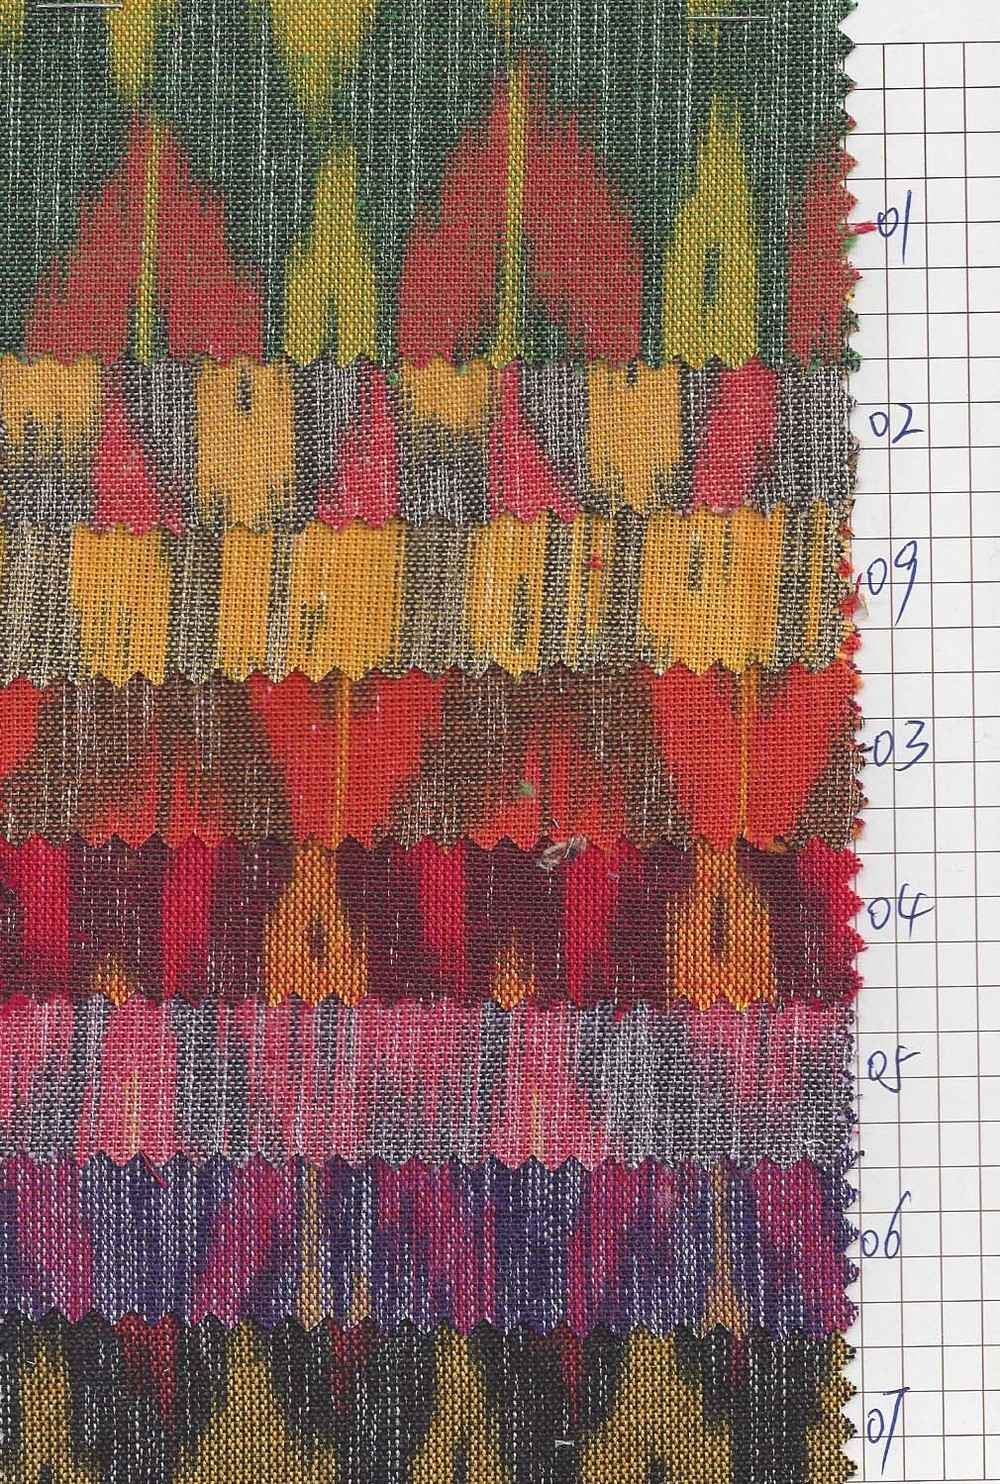 GYTY Textile 5.jpg